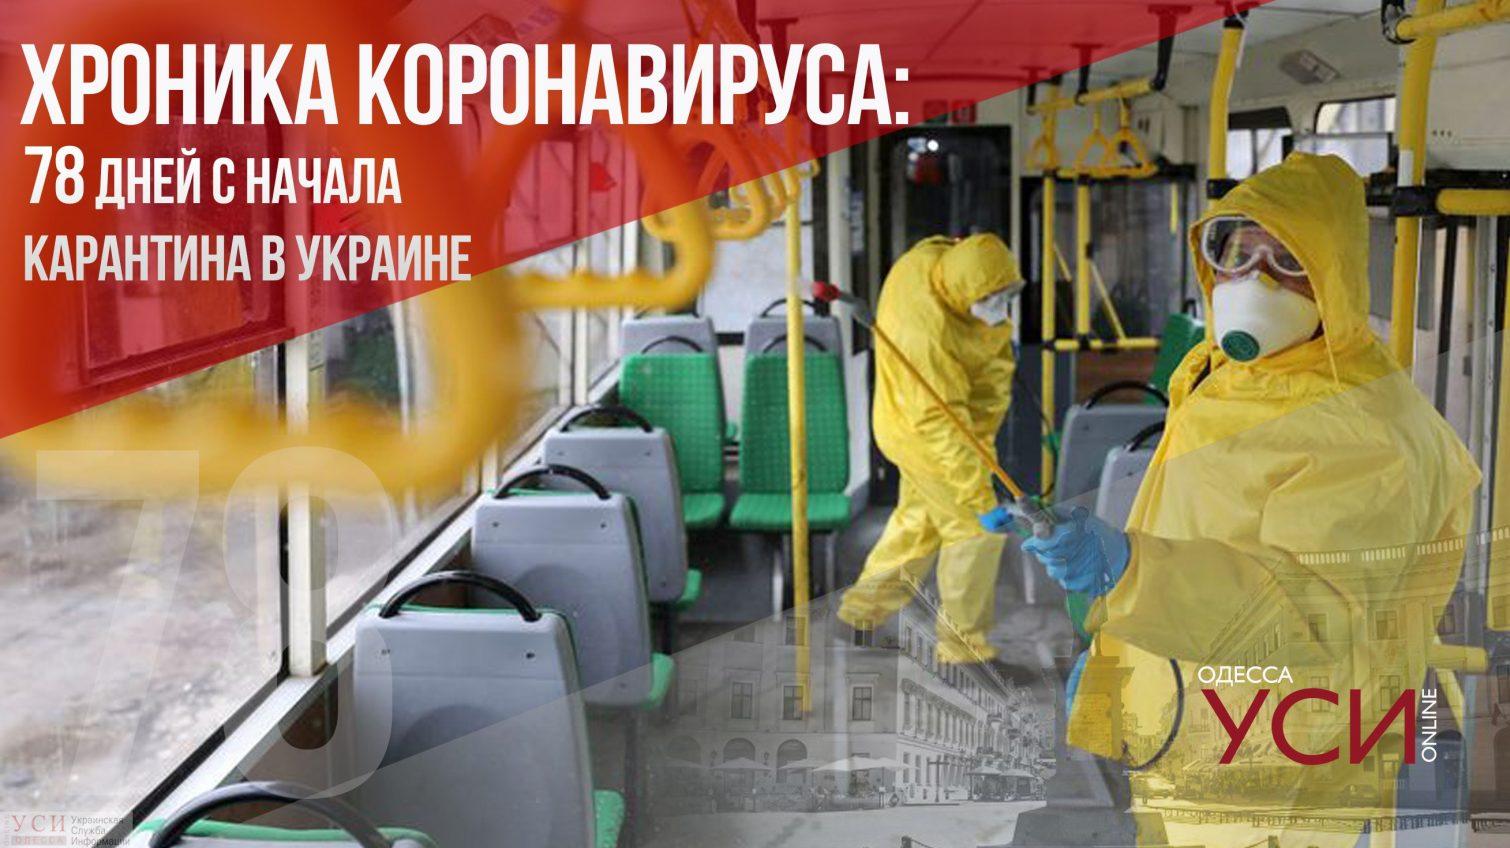 Хроника коронавируса: 78 дней с начала карантина в Украине ОБНОВЛЯЕТСЯ «фото»